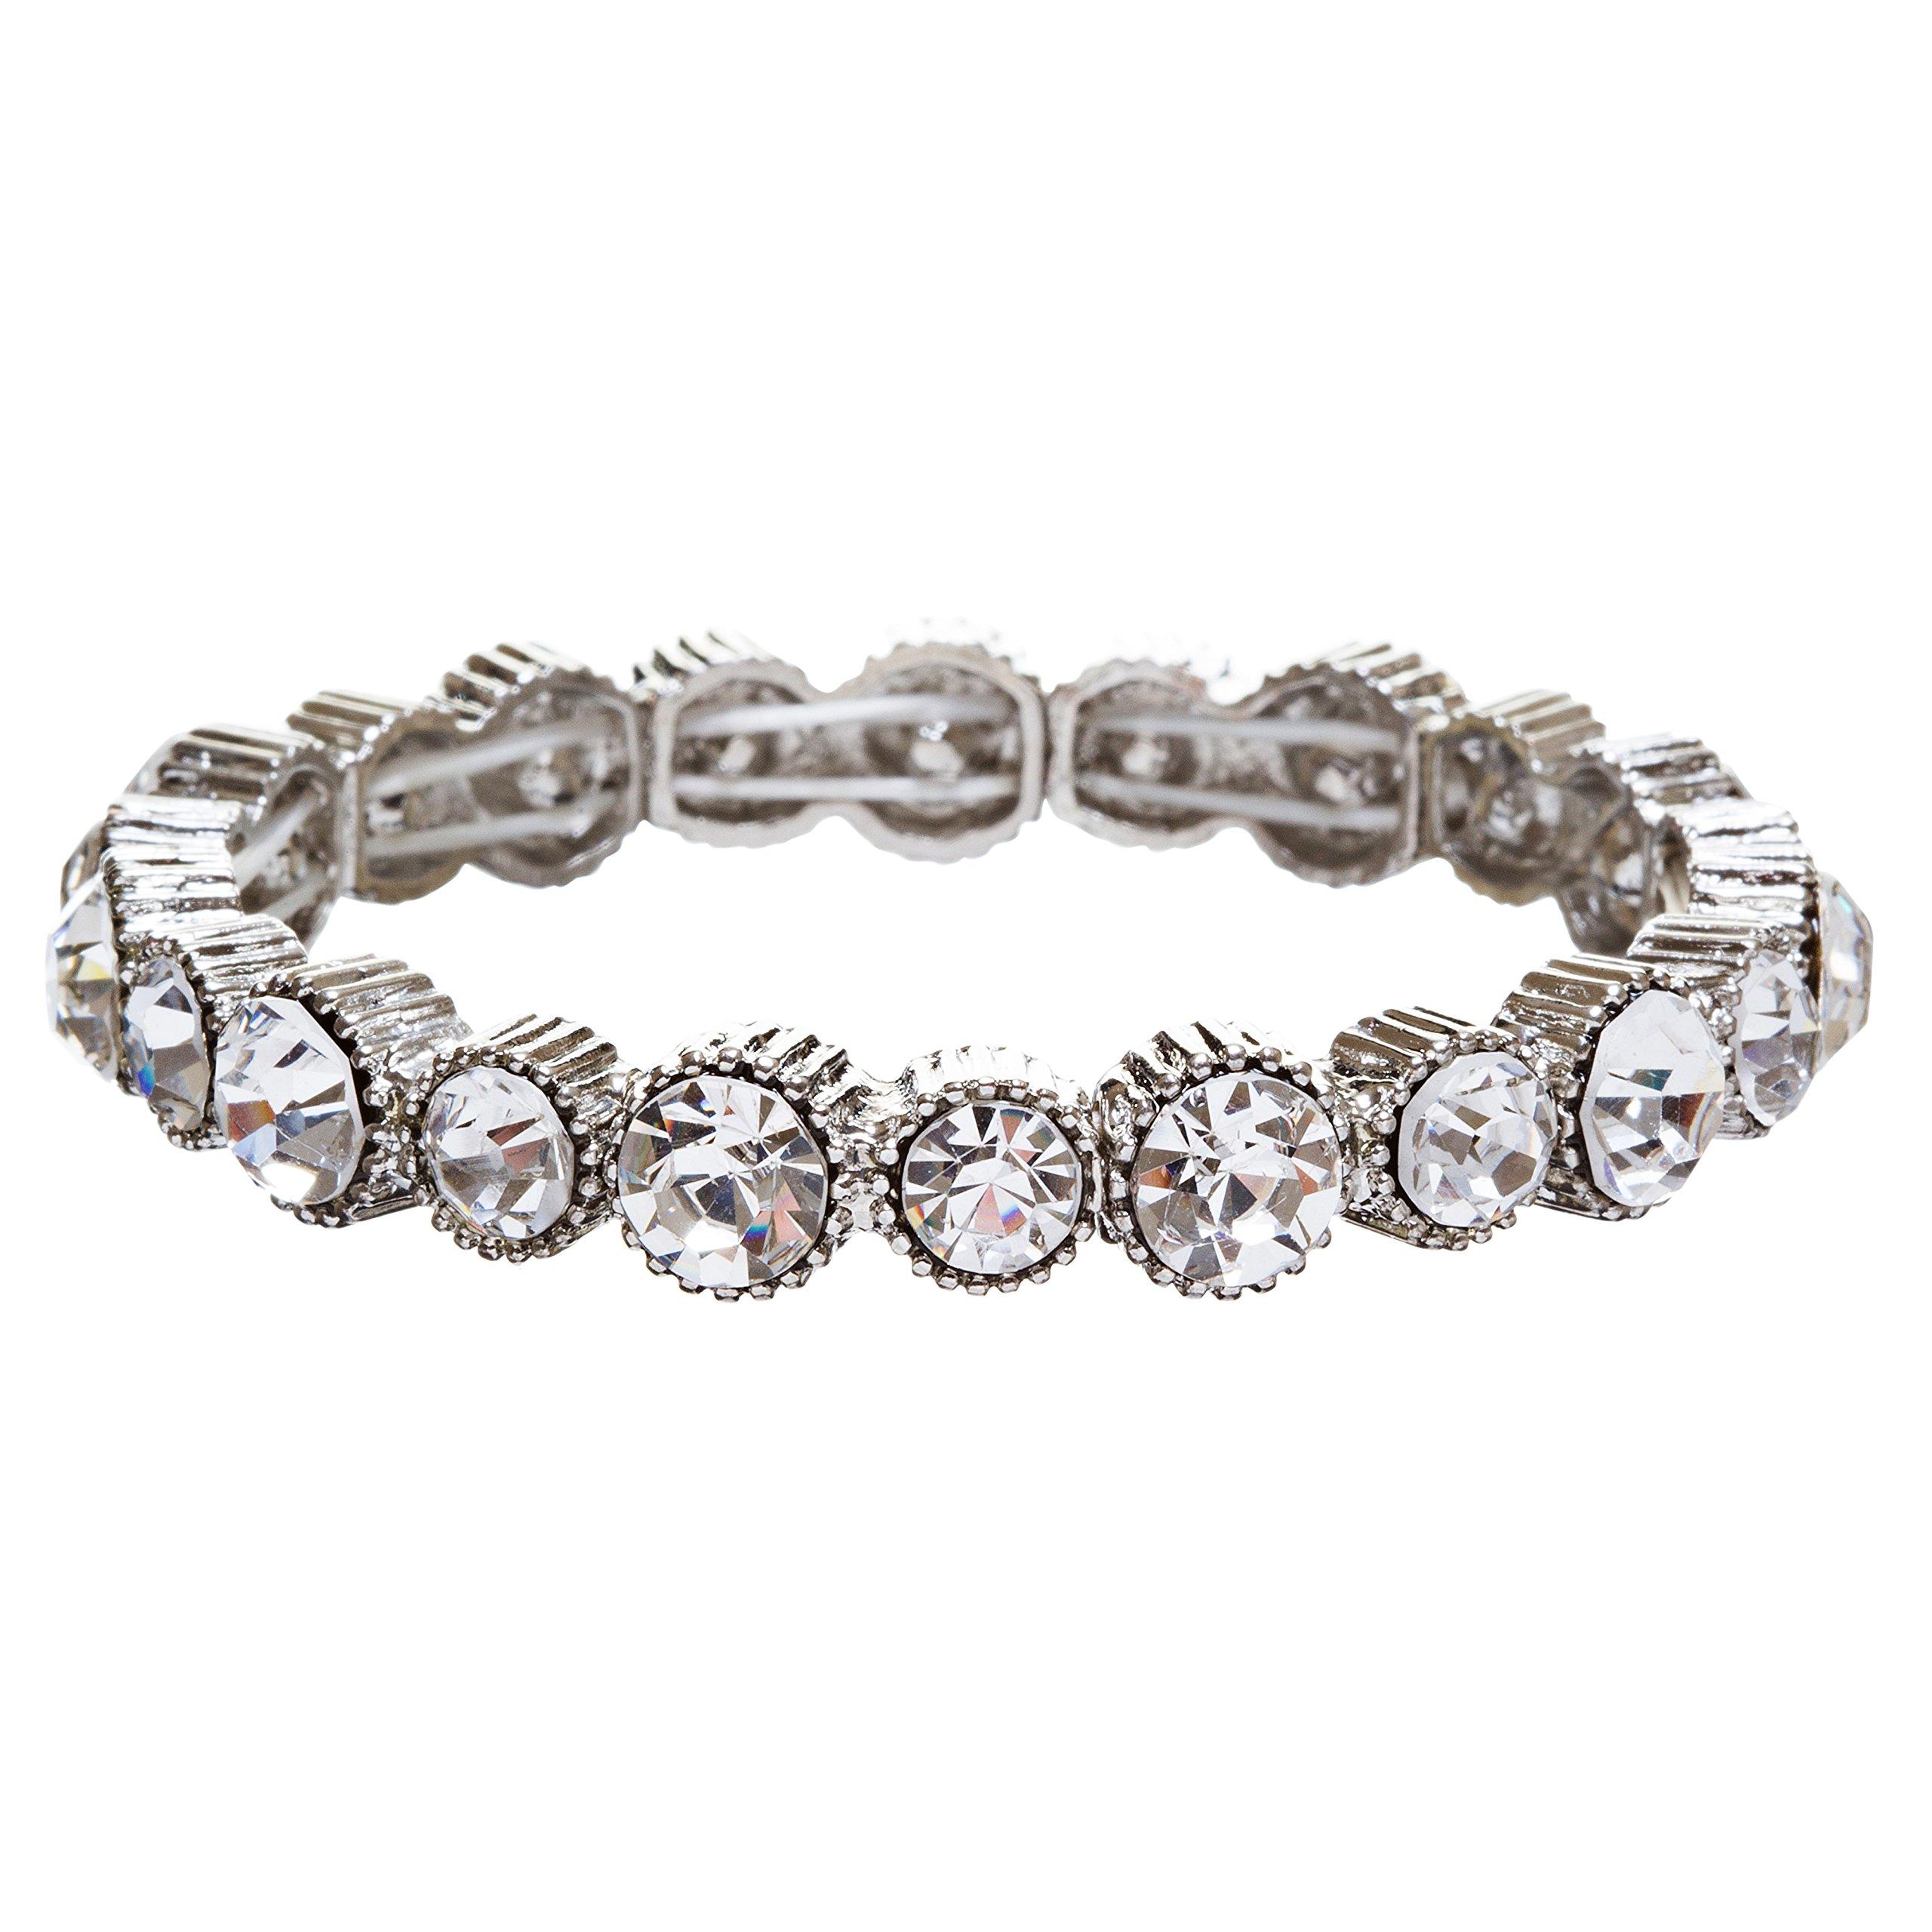 ACCESSORIESFOREVER Women Bridal Wedding Jewelry Crystal Rhinestone Simple Yet Elegant Bracelet B308 SV by Accessoriesforever (Image #1)